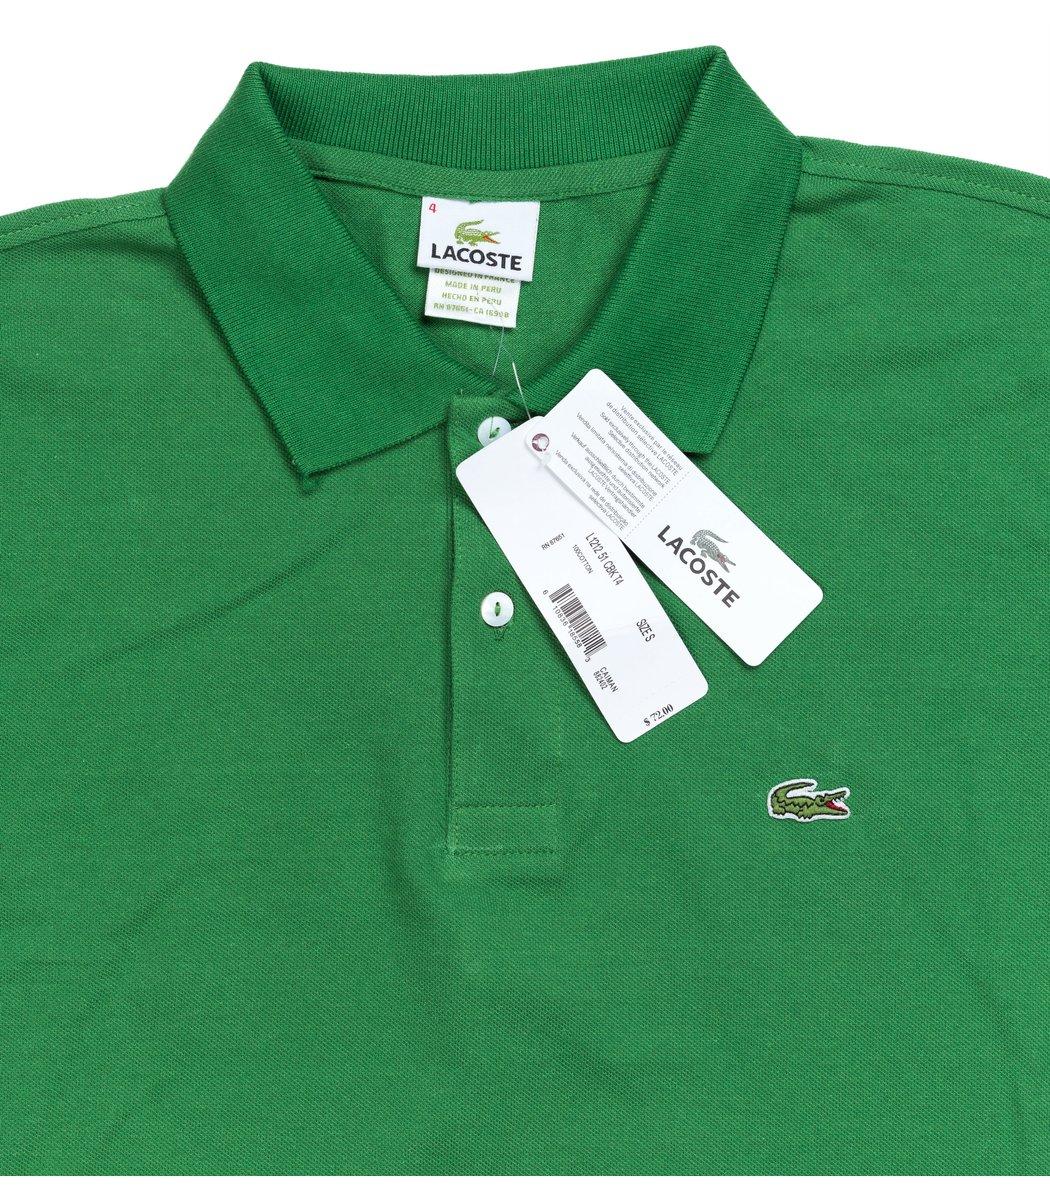 Мужская зеленая футболка поло Lacoste